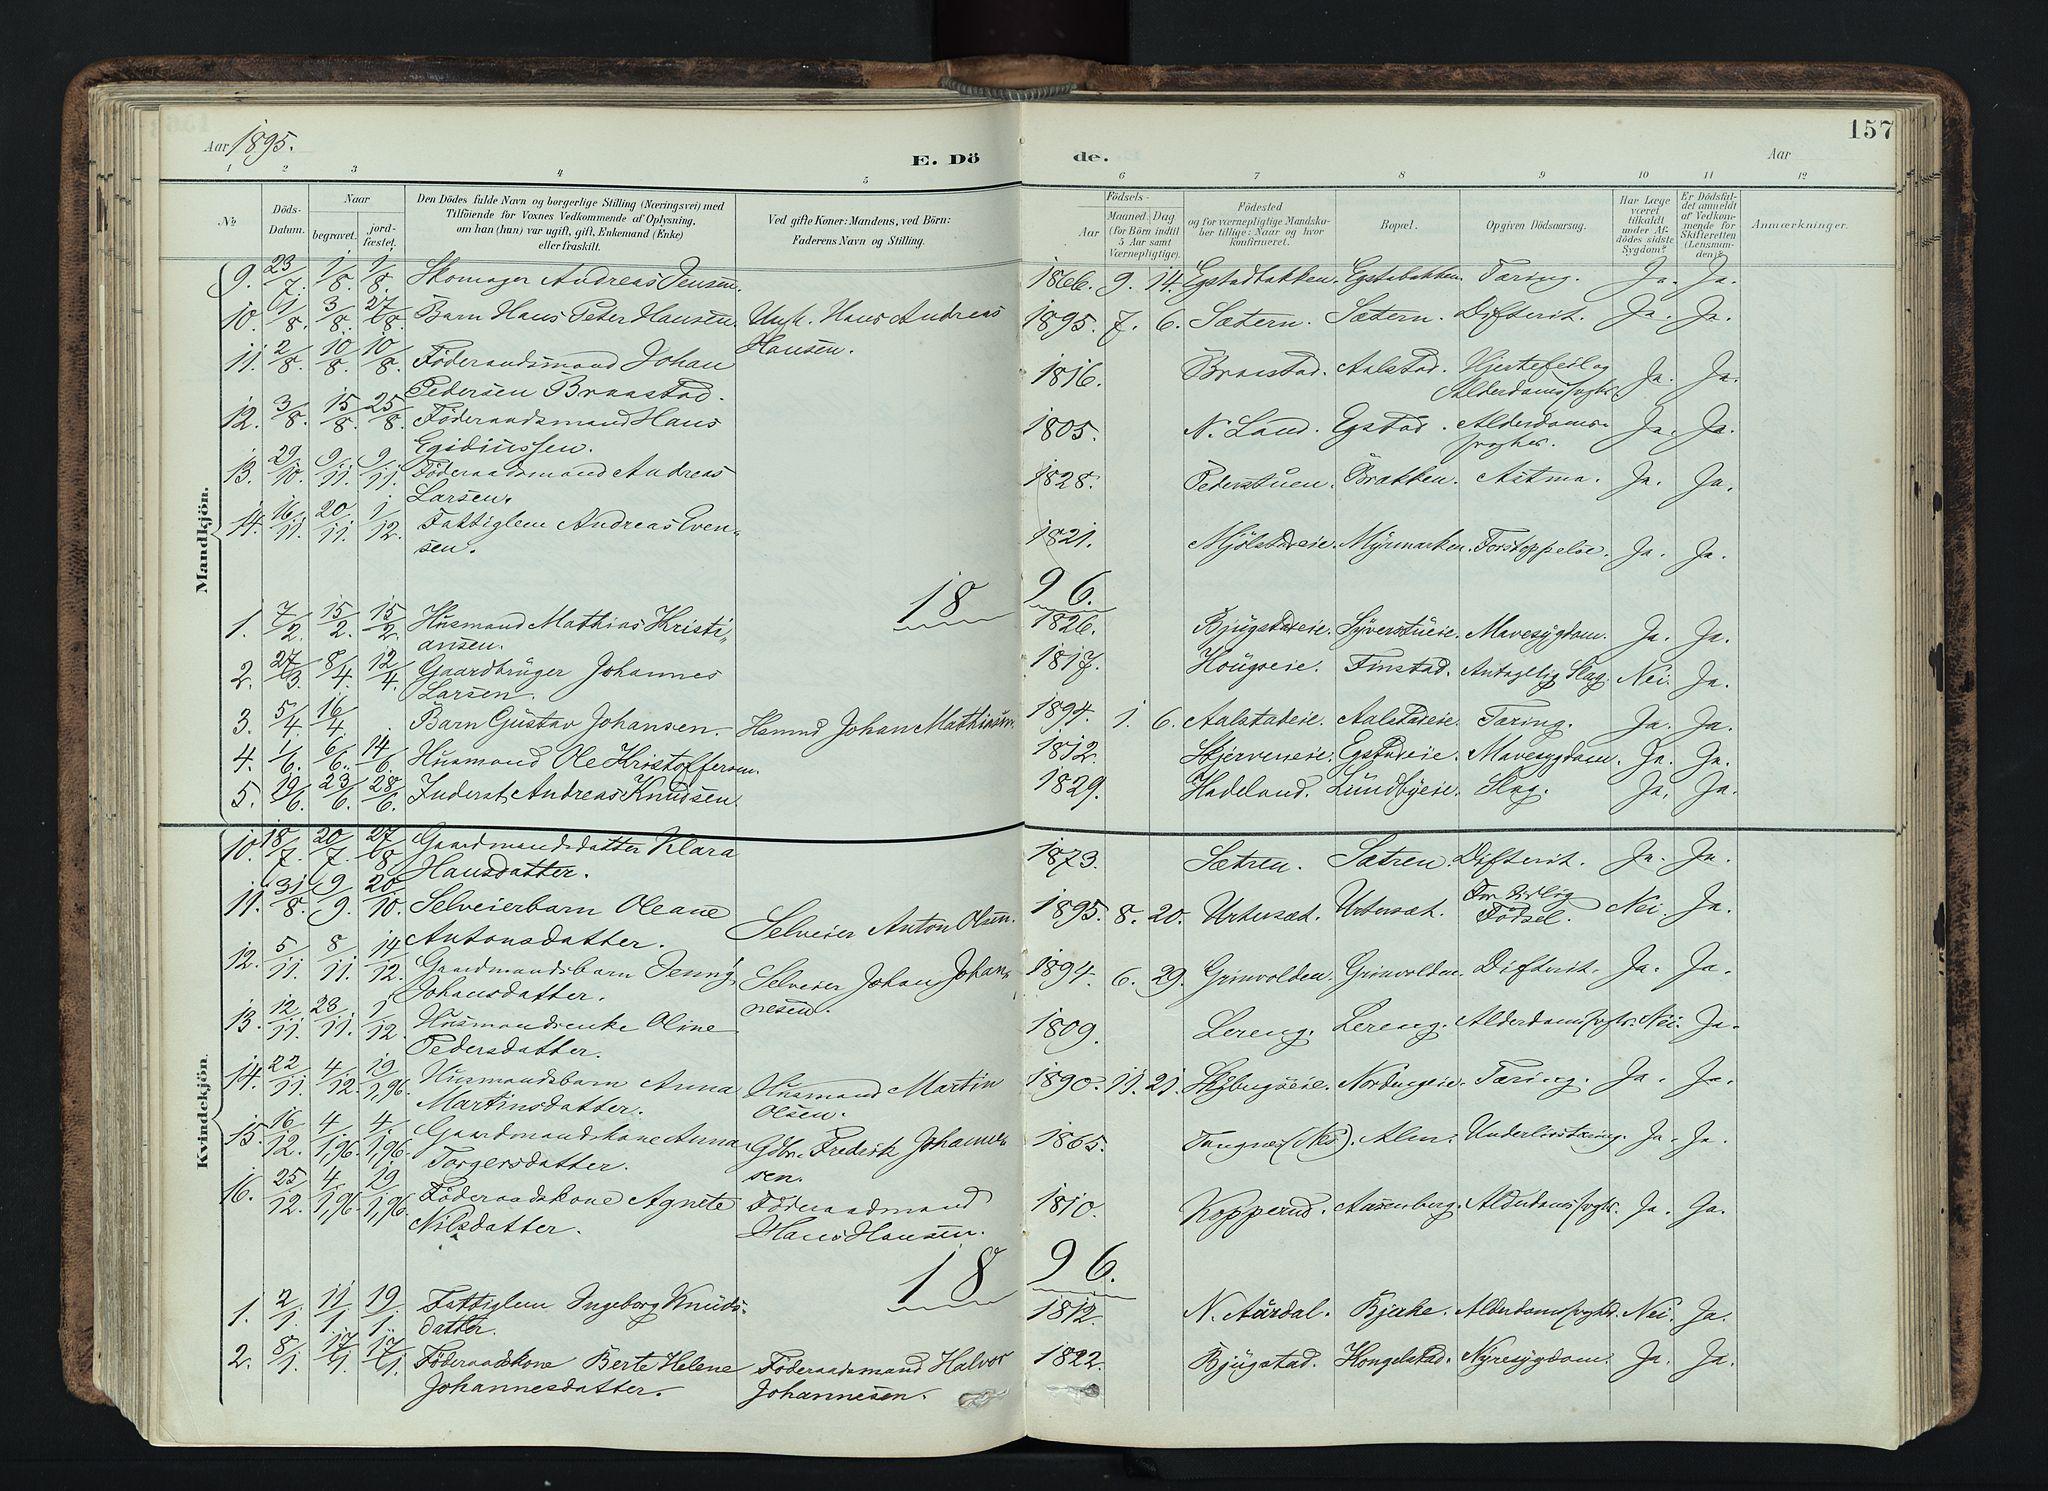 SAH, Vardal prestekontor, H/Ha/Haa/L0019: Ministerialbok nr. 19, 1893-1907, s. 157